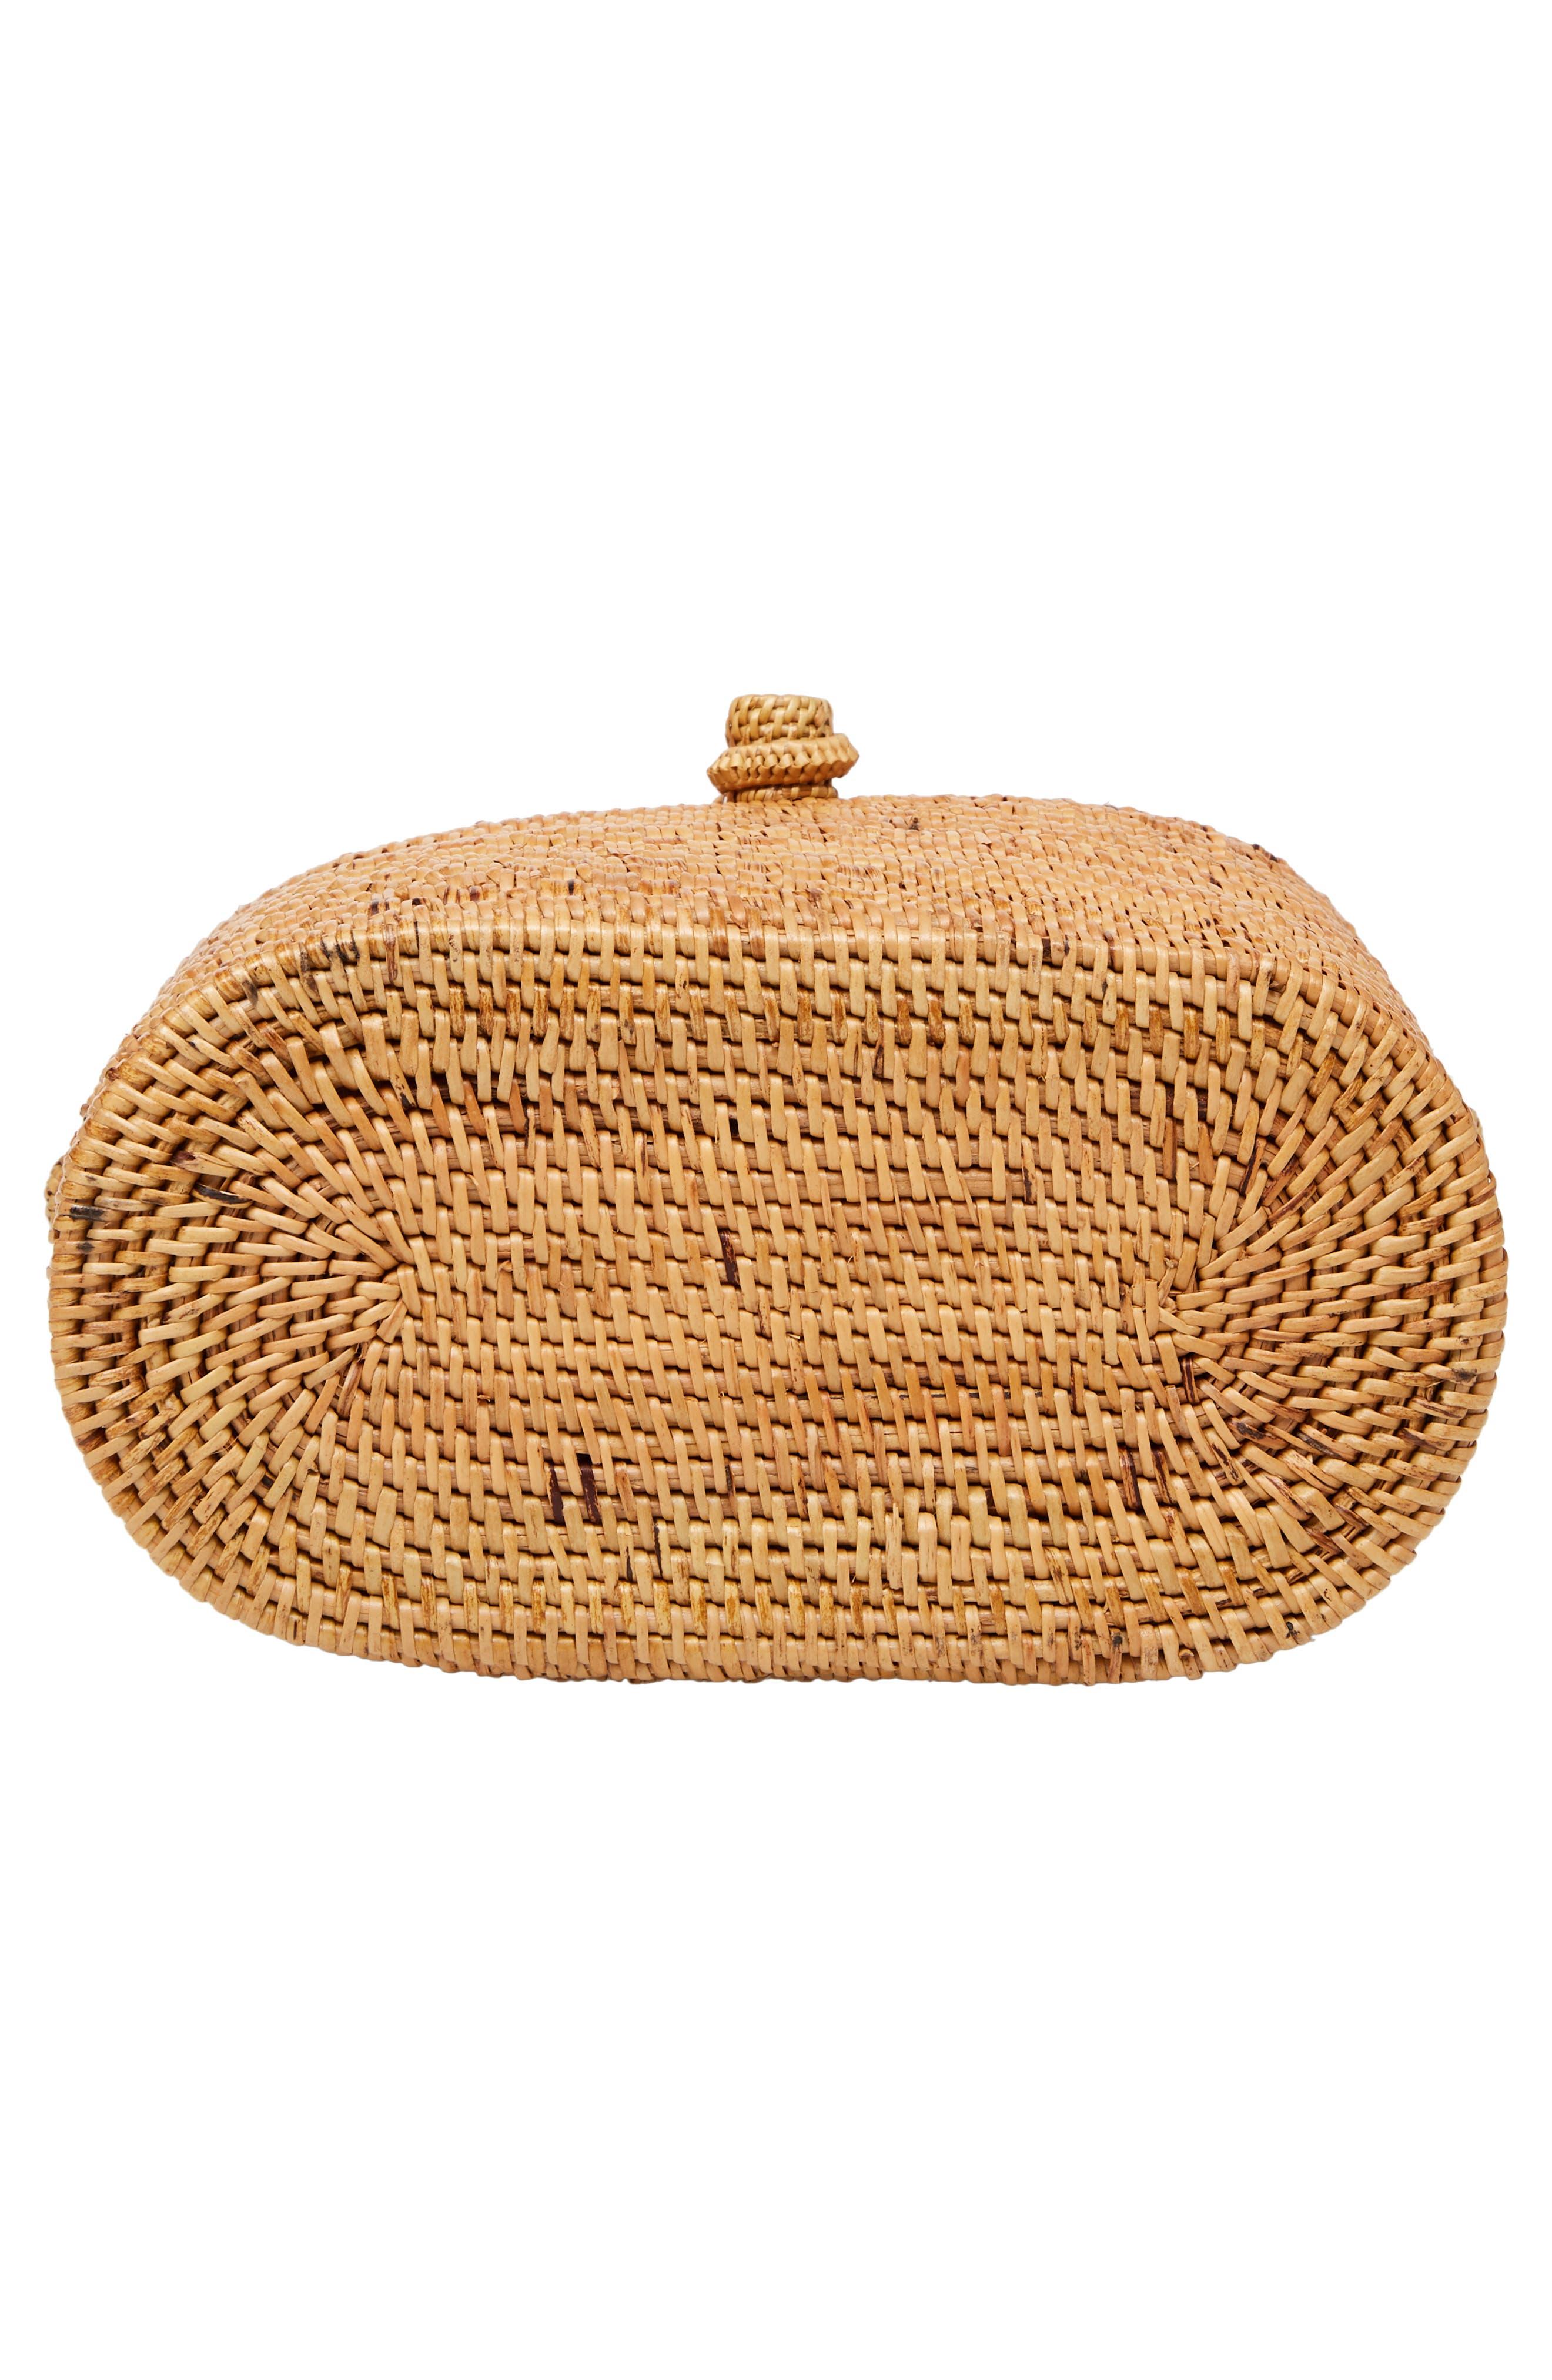 Woven Rattan Box Crossbody Bag,                             Alternate thumbnail 6, color,                             200